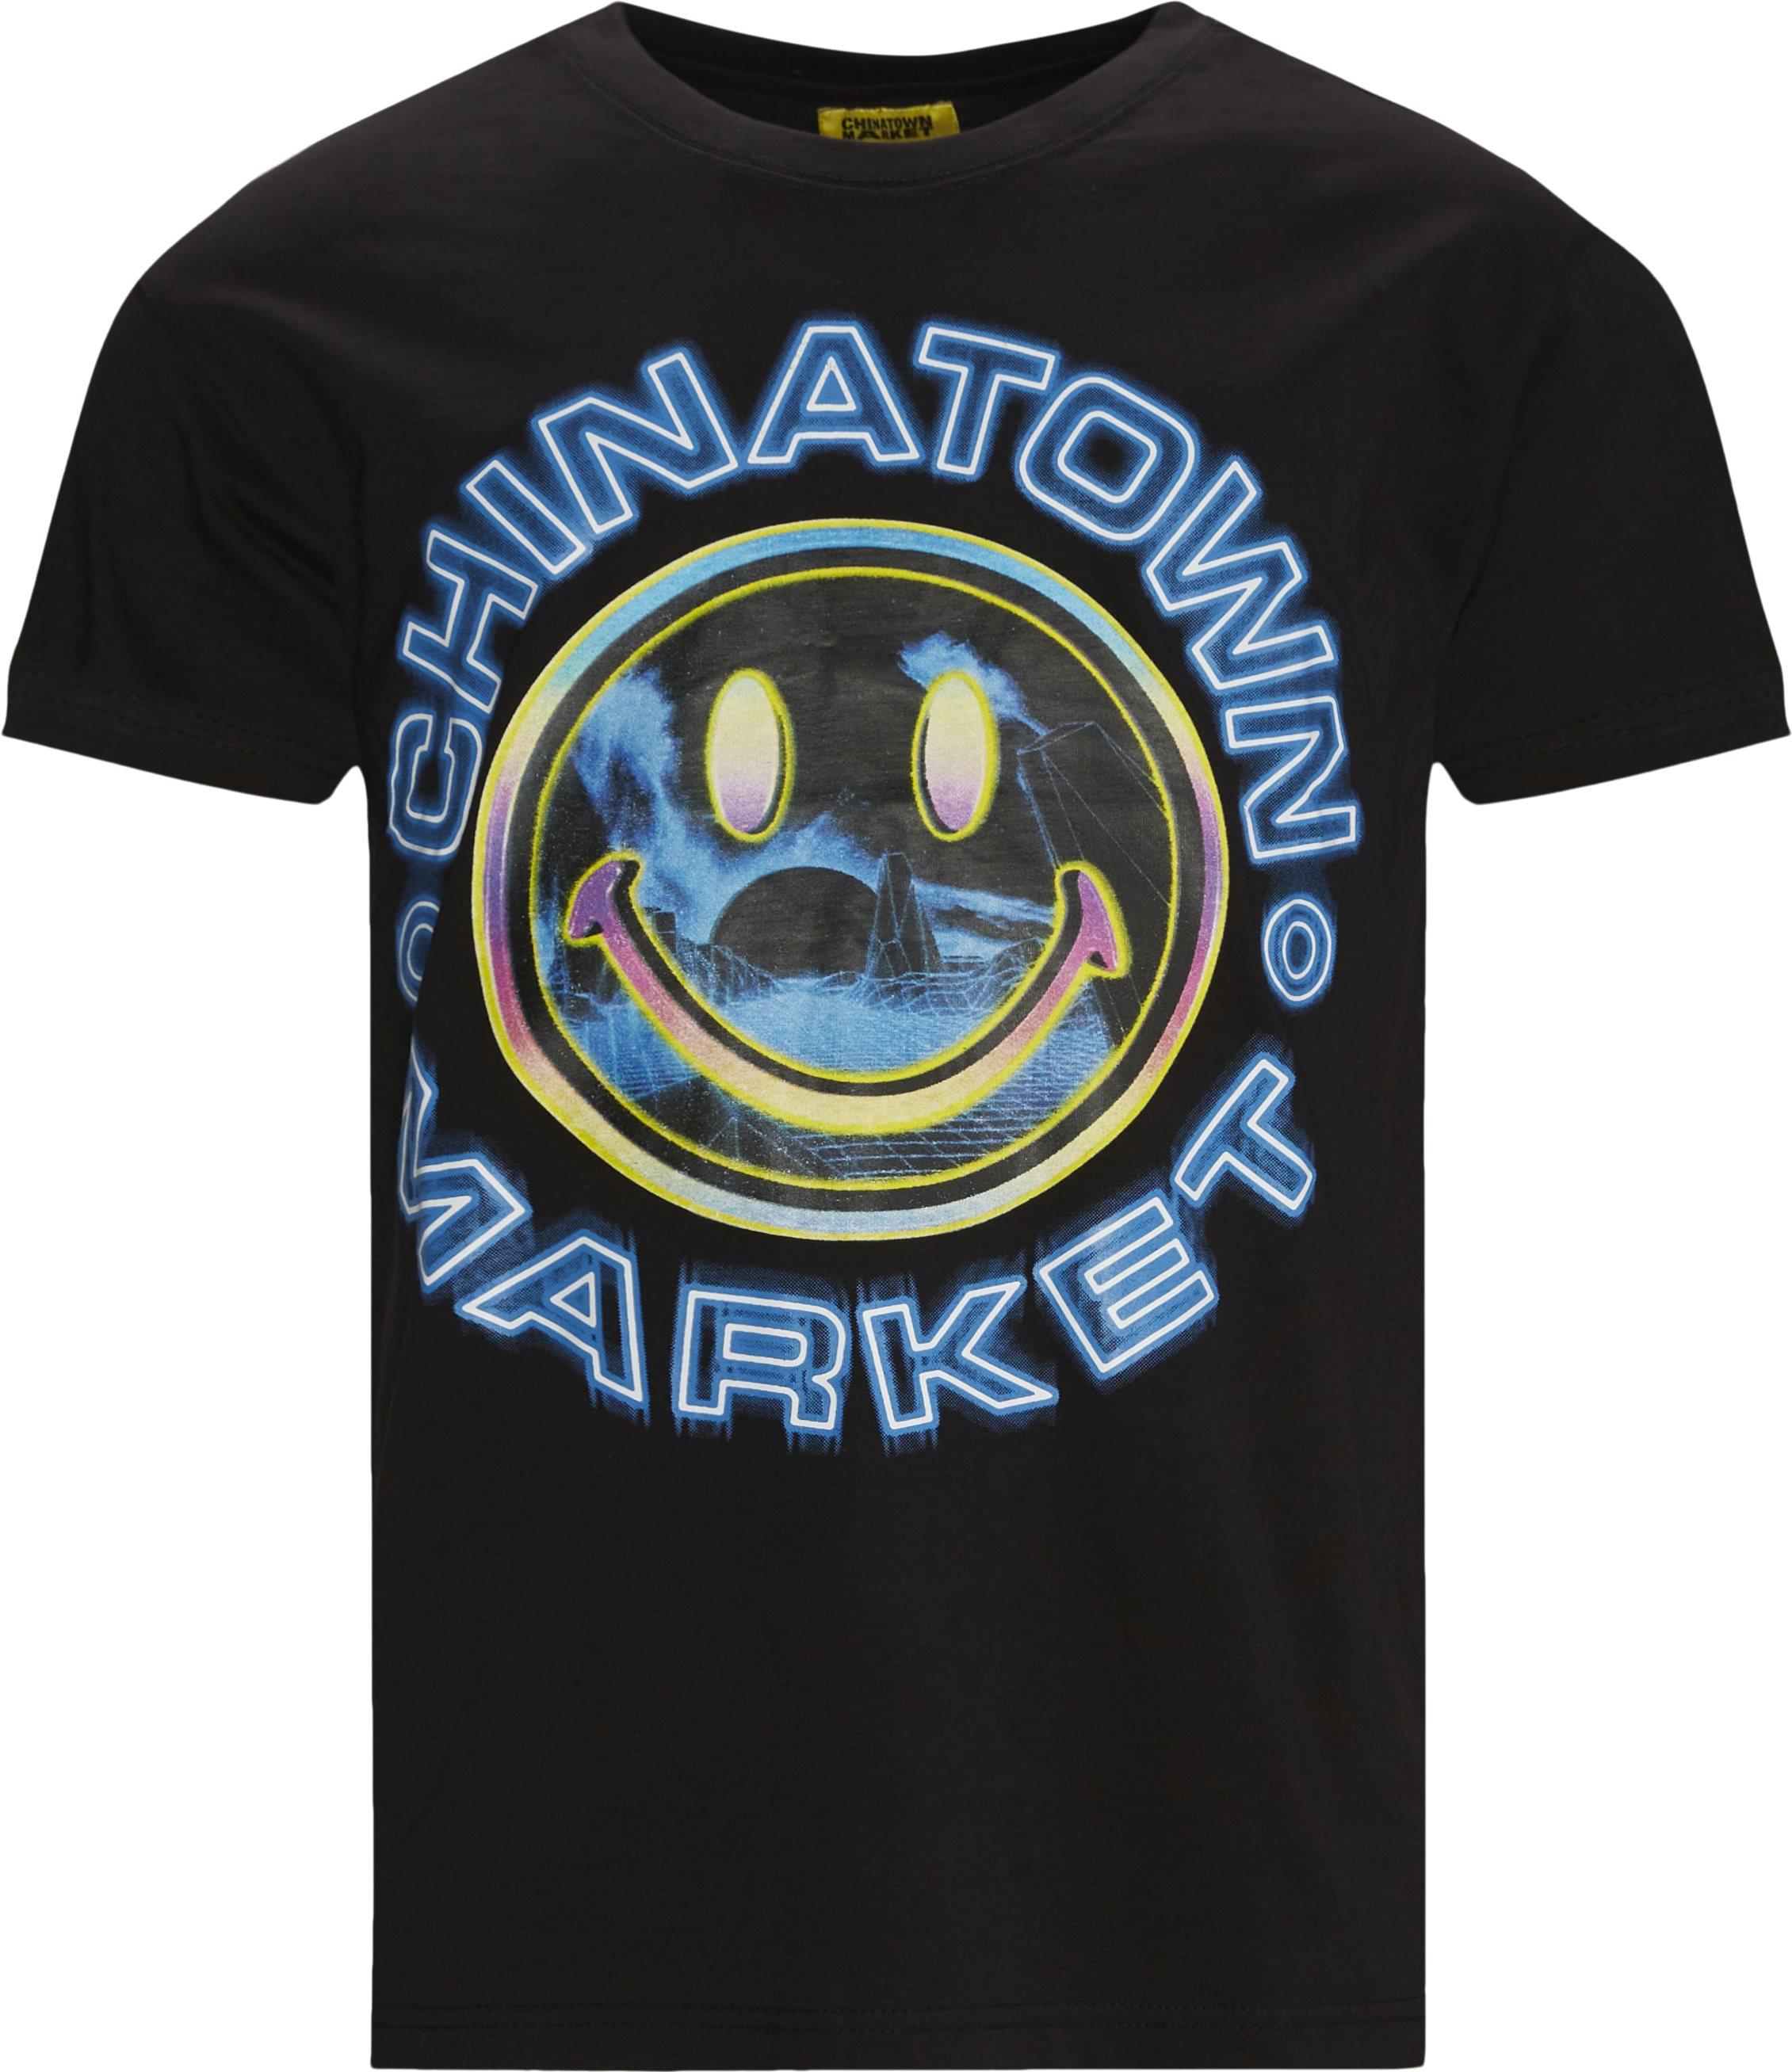 SMILEY VAPOR WAVE T-shirt - T-shirts - Regular fit - Sort